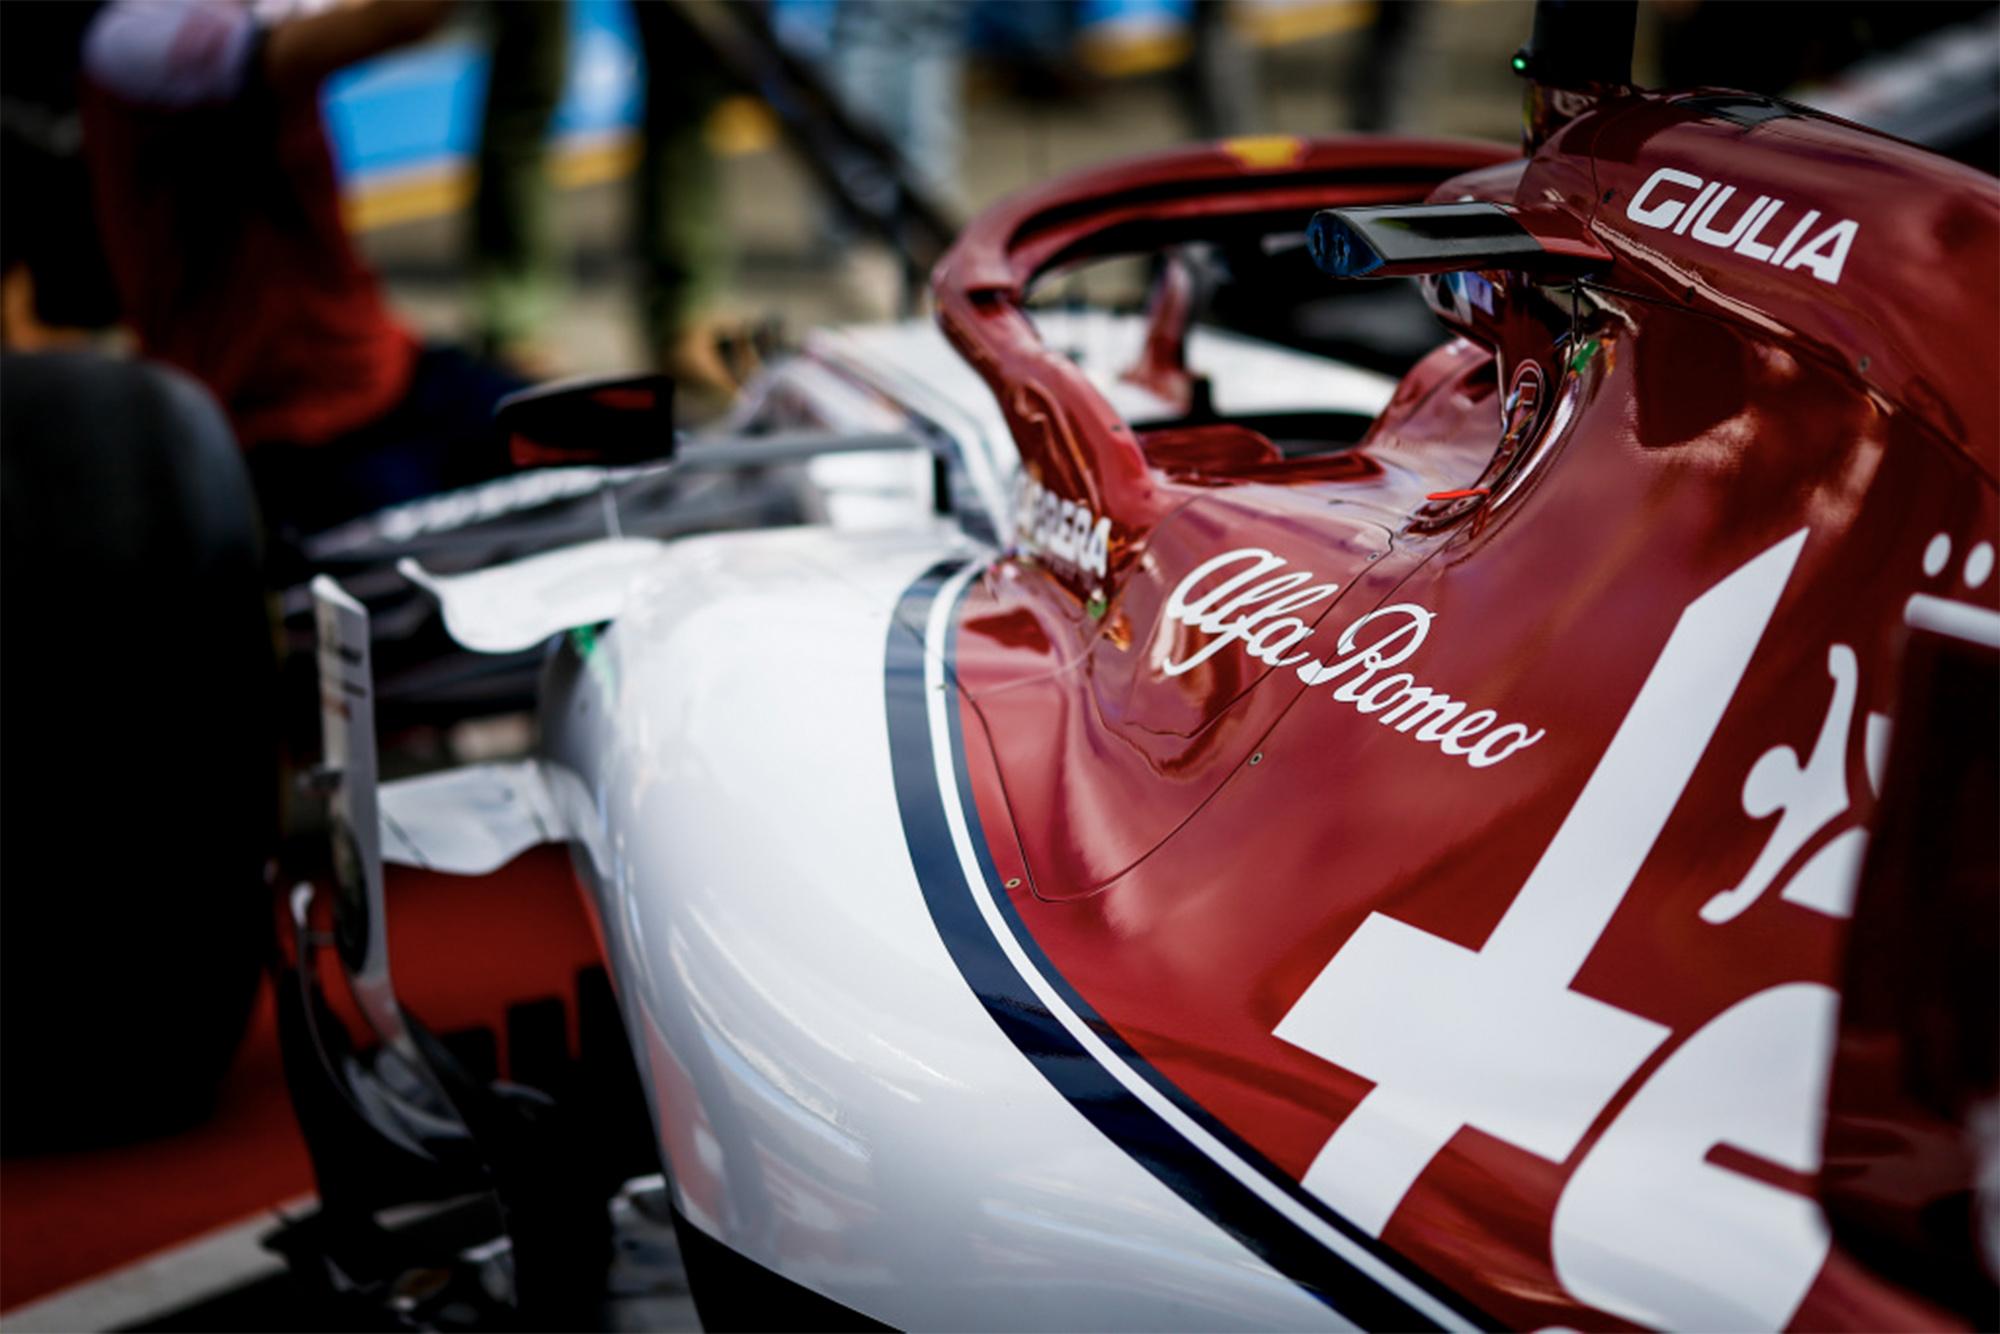 2019 Alfa Romeo F1 car in the pits